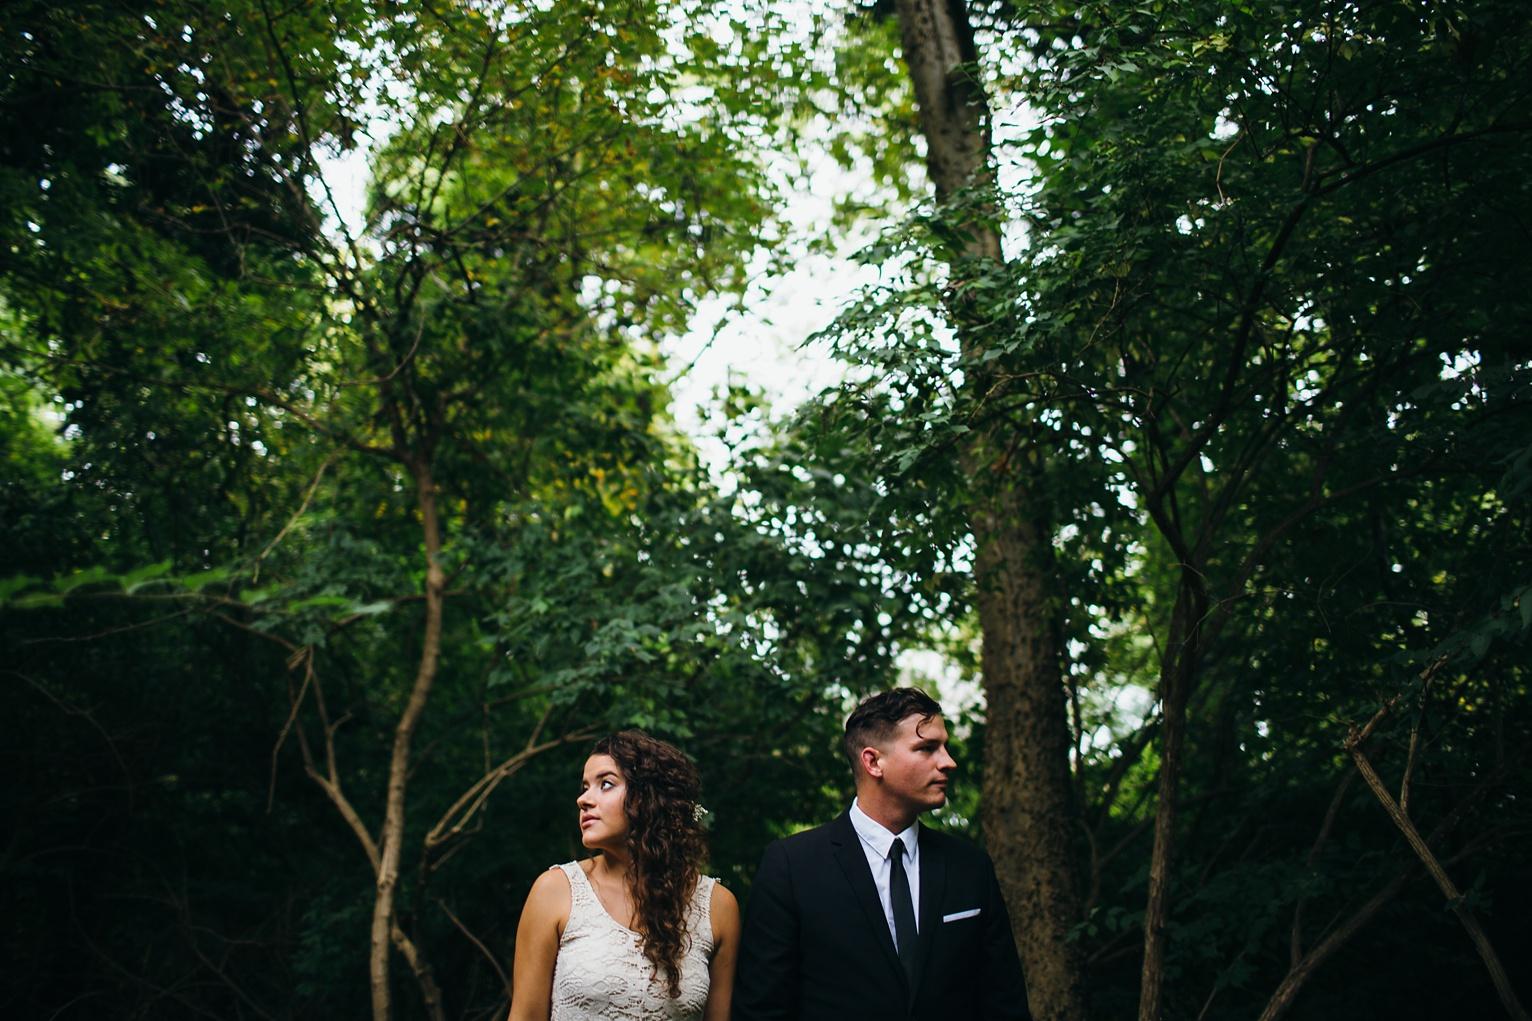 Dreamtownco.com_blog_Matt&Ashleigh_Wedding_0041.jpg